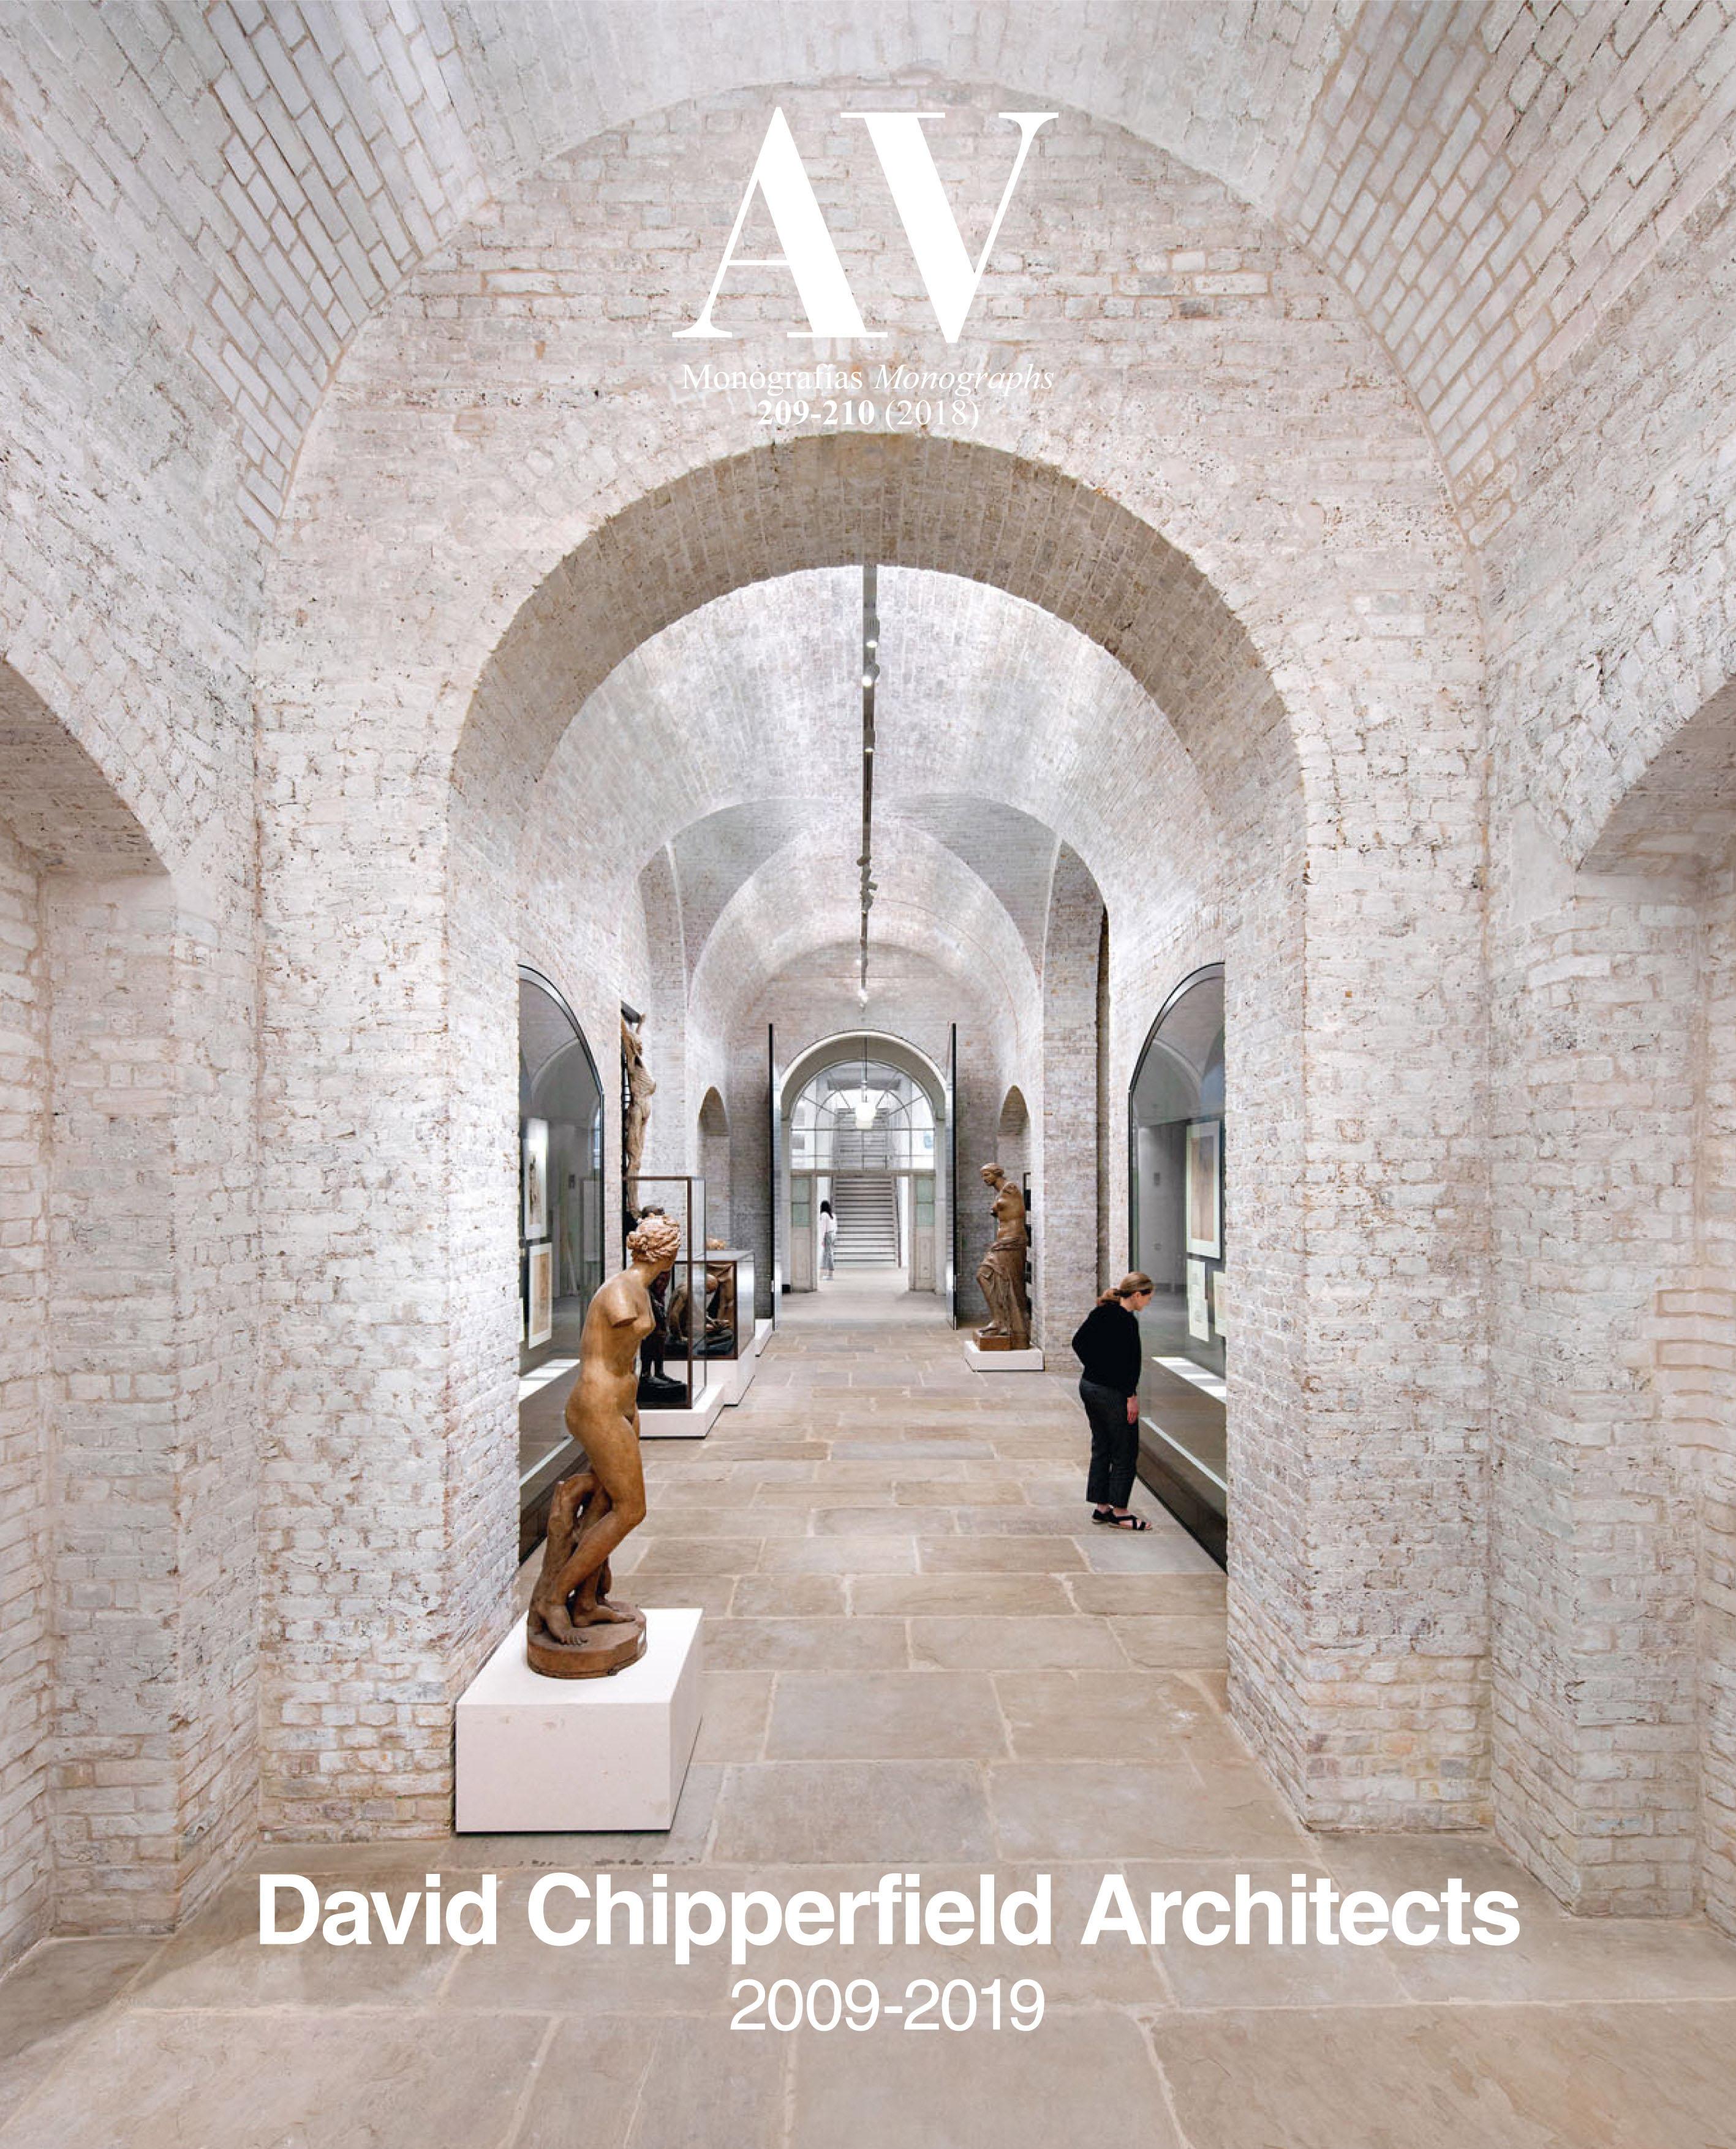 David Chipperfield Architects